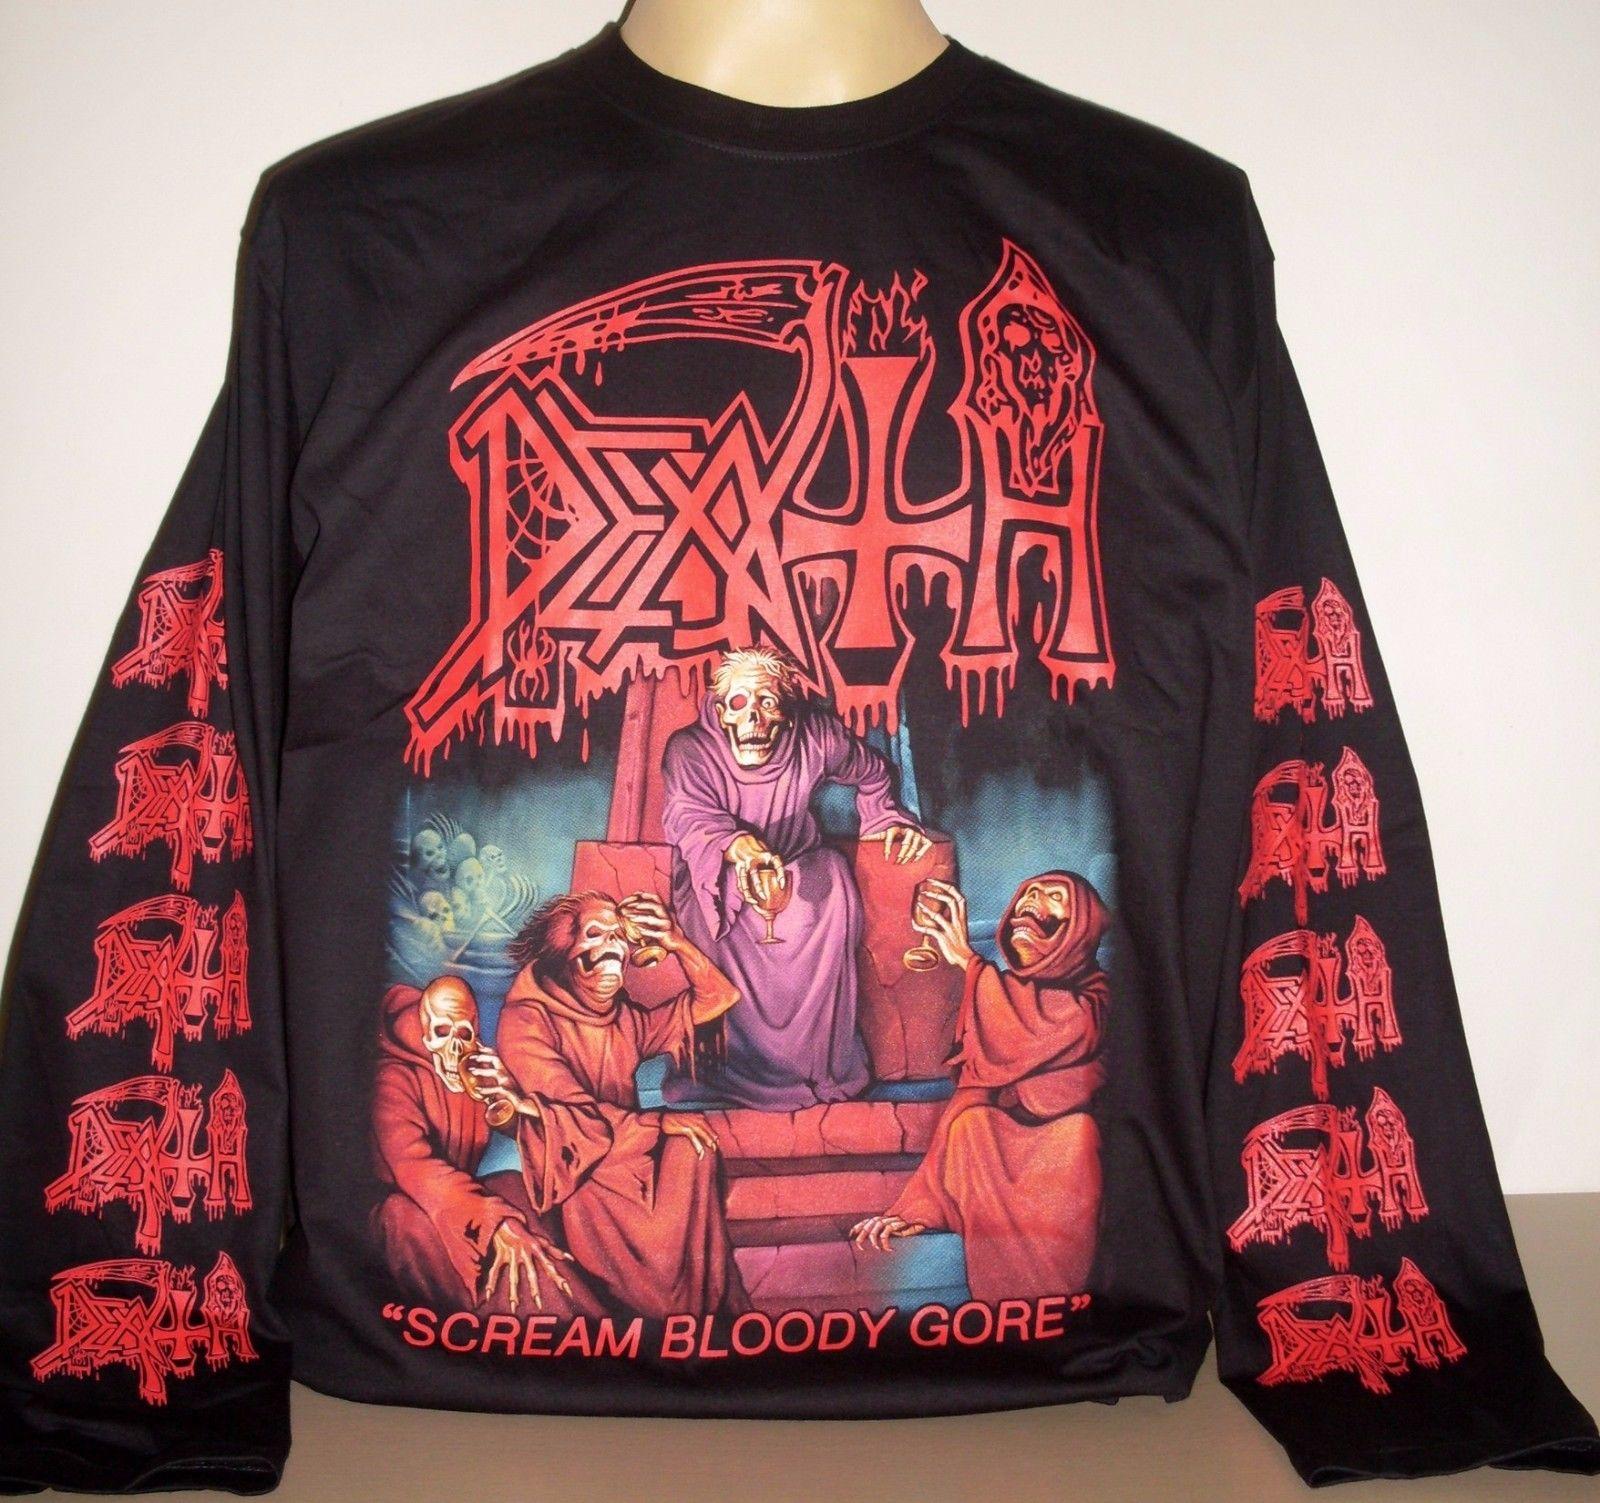 Cannabis Corpse Death Metal Band Men/'s Black T-Shirt Size S M L XL 2XL 3XL